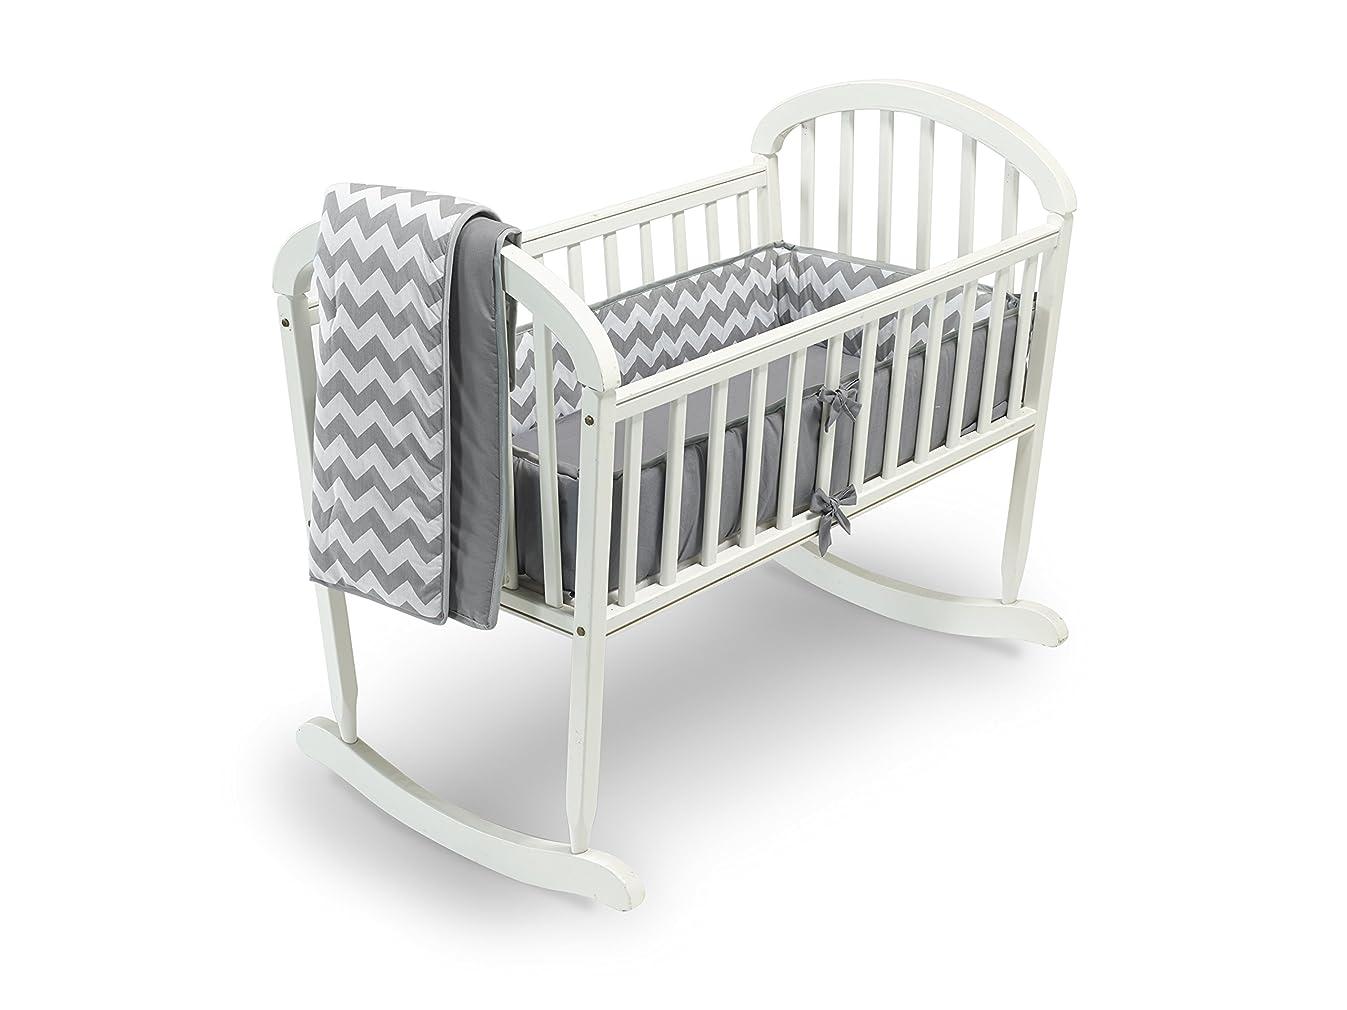 Baby Doll Bedding Chevron Cradle Bedding Set, Grey